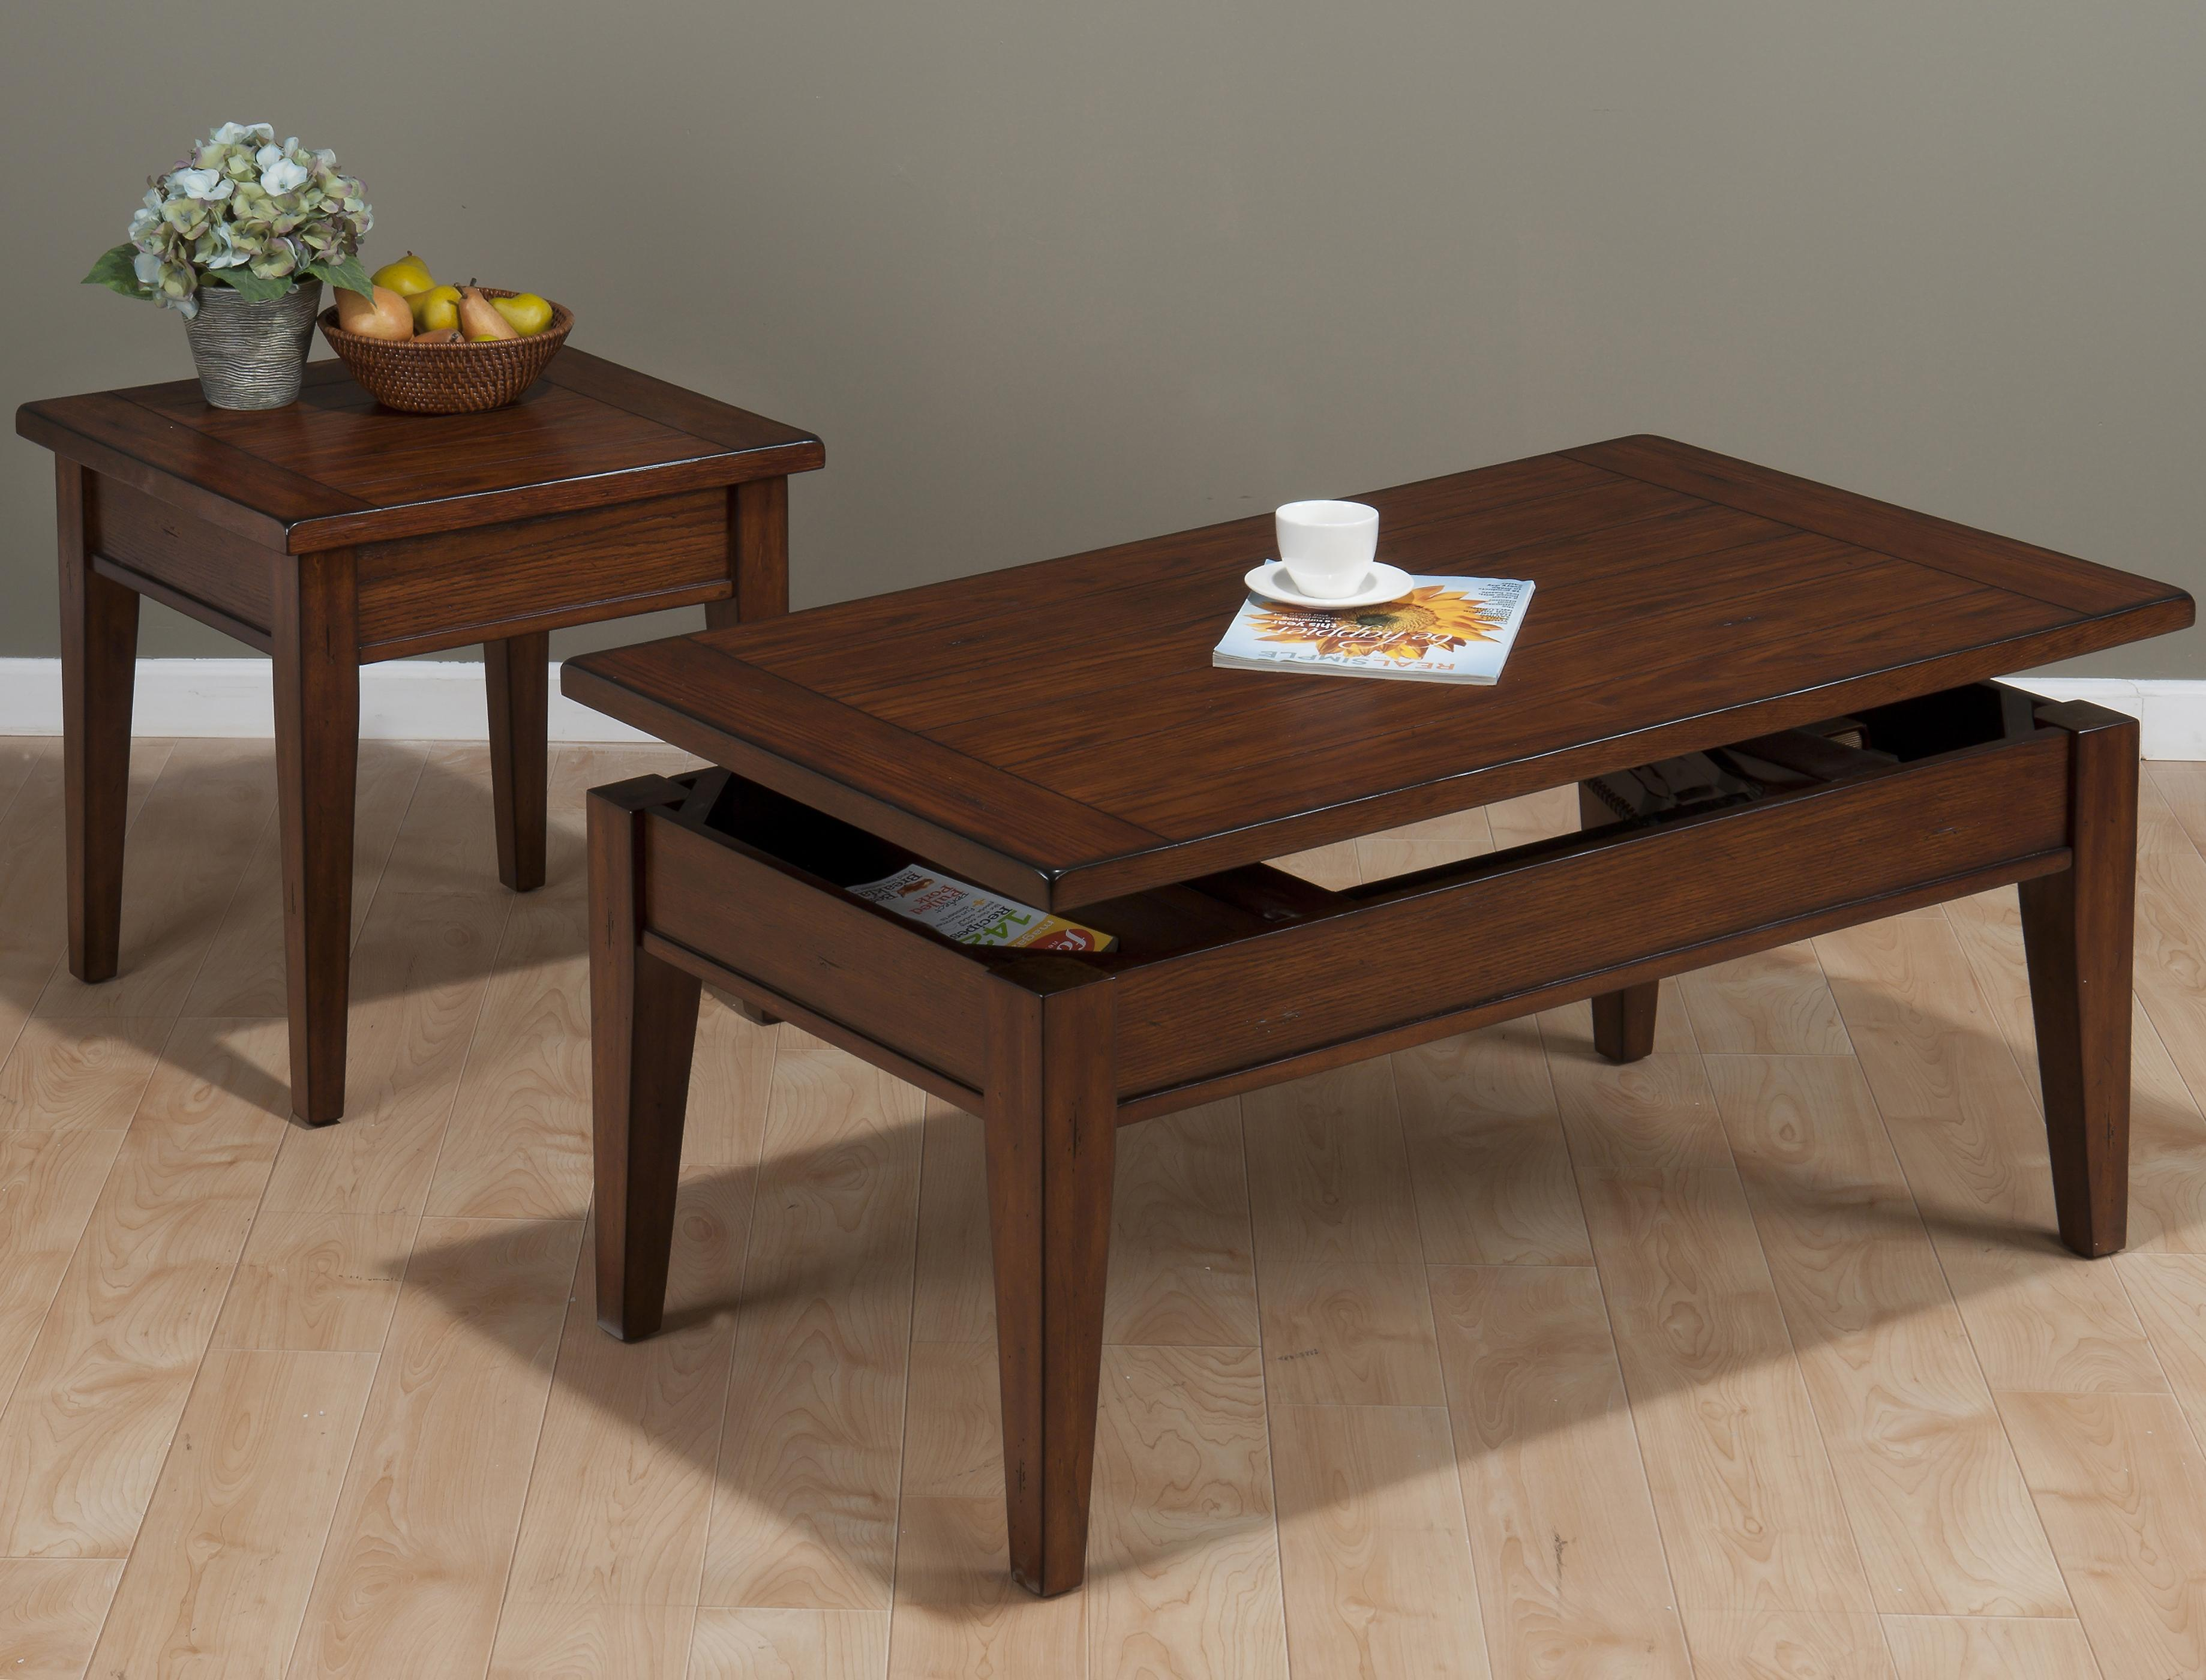 Jofran Dunbar Oak Occasional Table Group - Item Number: 411 Occasional Table Group 1